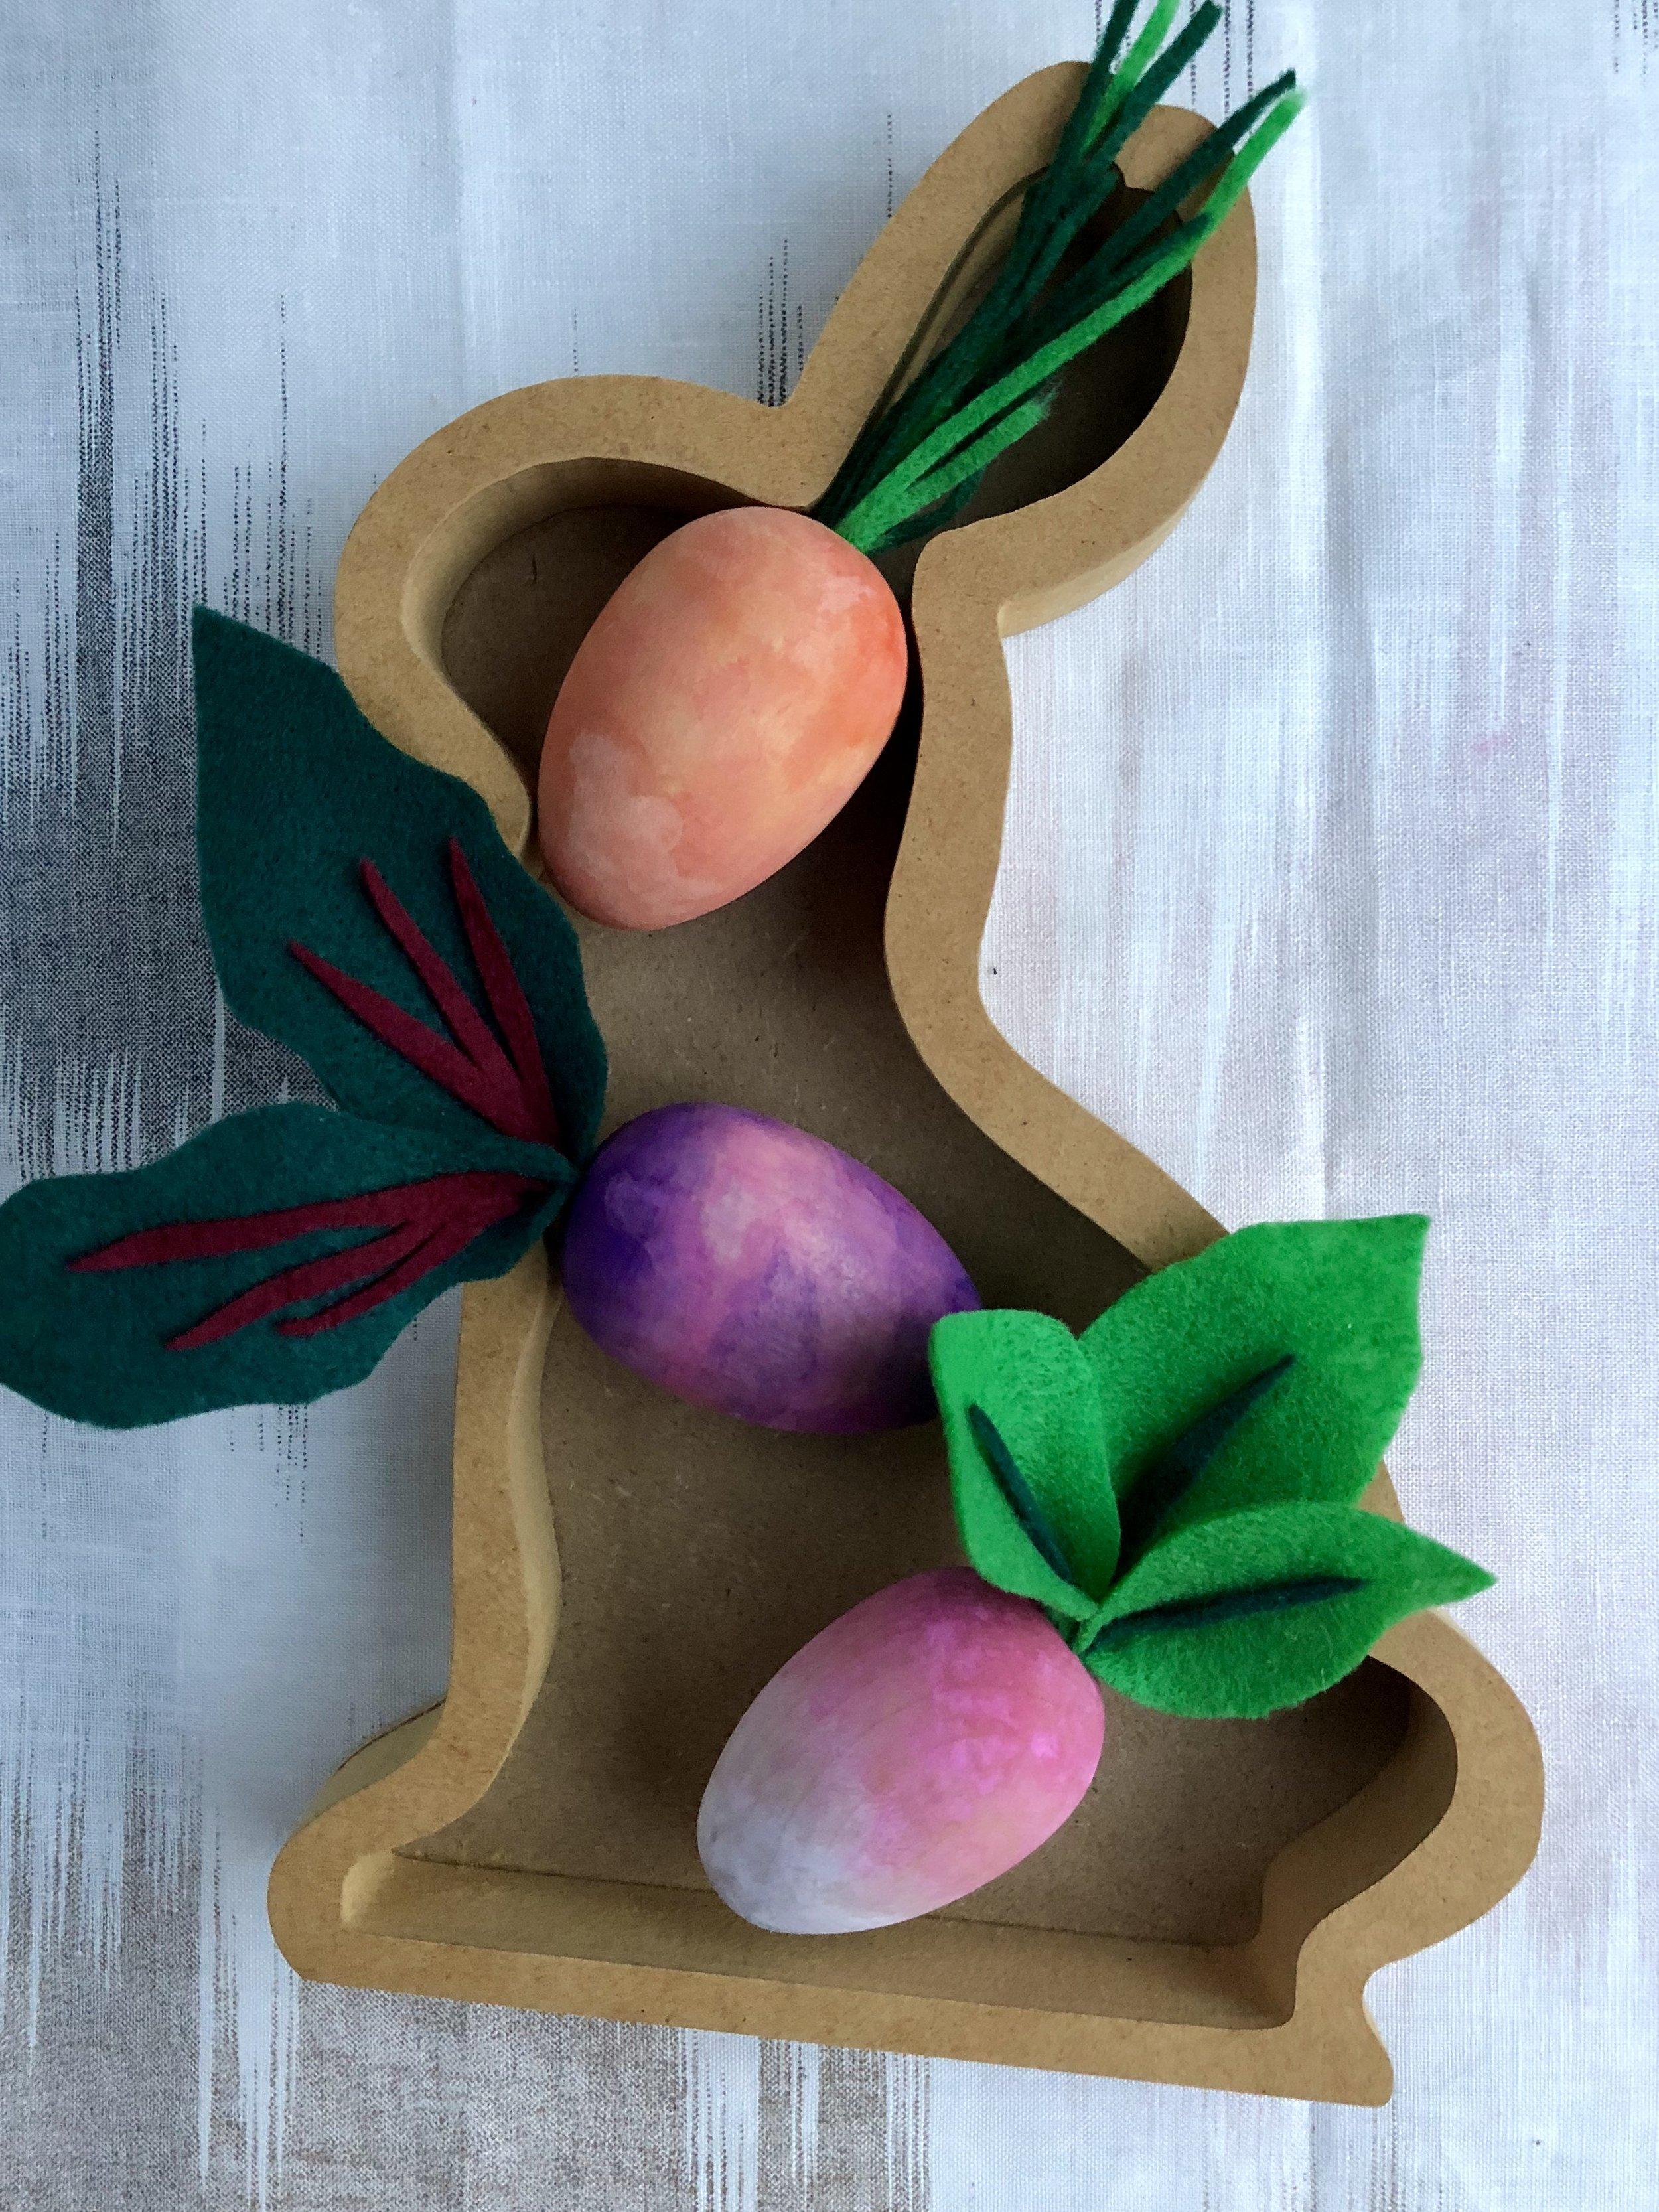 DIY Wooden Watercolor Root Vegetable Easter Eggs #eastereggs #nomesseastereggs #watercolor #easter #easterdiy #easterdecor #easterdecorations #woodeneastereggs #woodcraft #craftsforkids #easycrafts #springcrafts #vegan #rootvegetables #vegetables #eatyourveggies #veggies